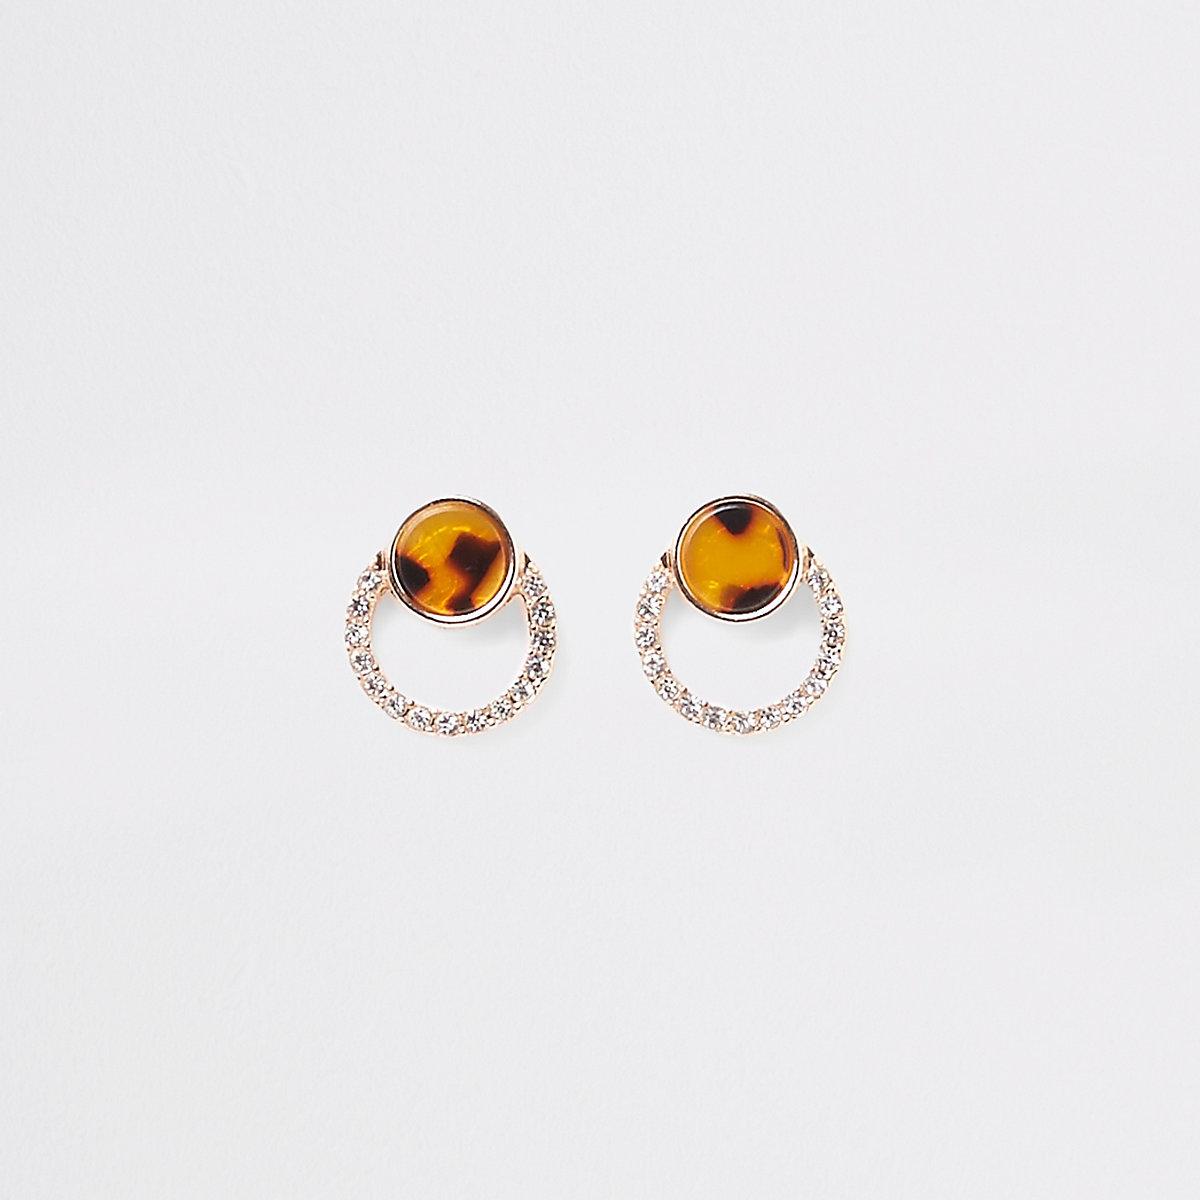 Gold color tortoise rhinestone stud earring